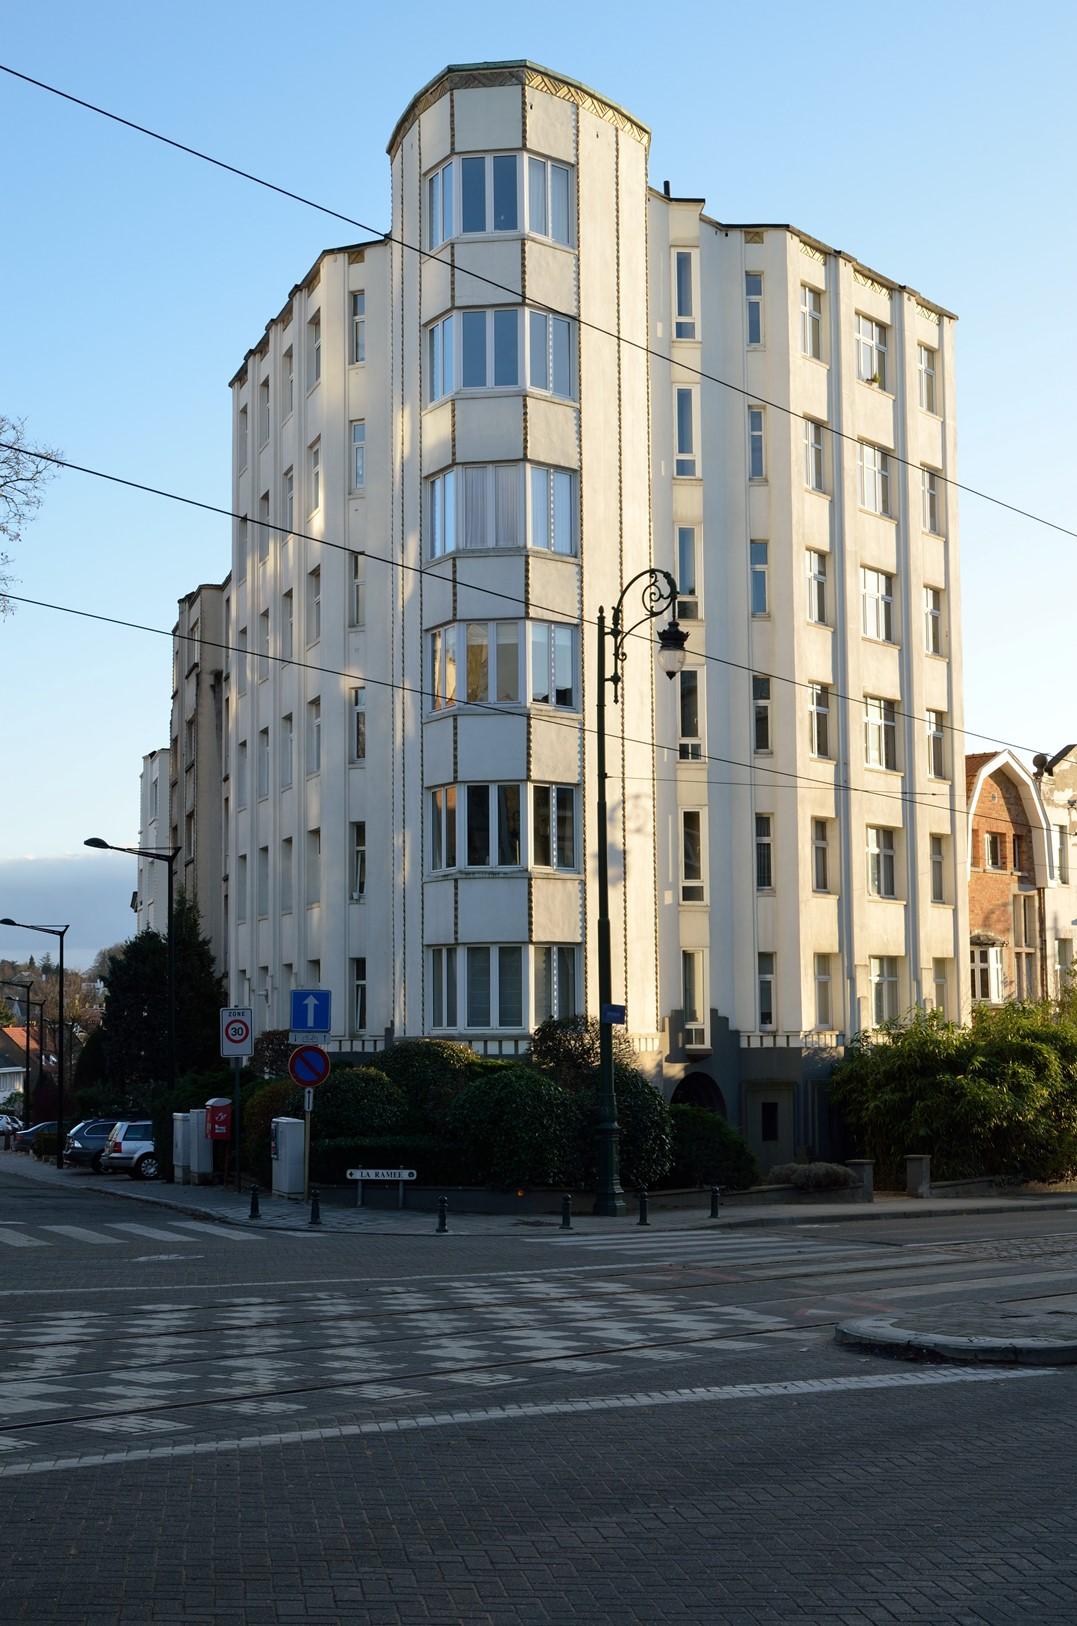 Avenue Brugmann 358